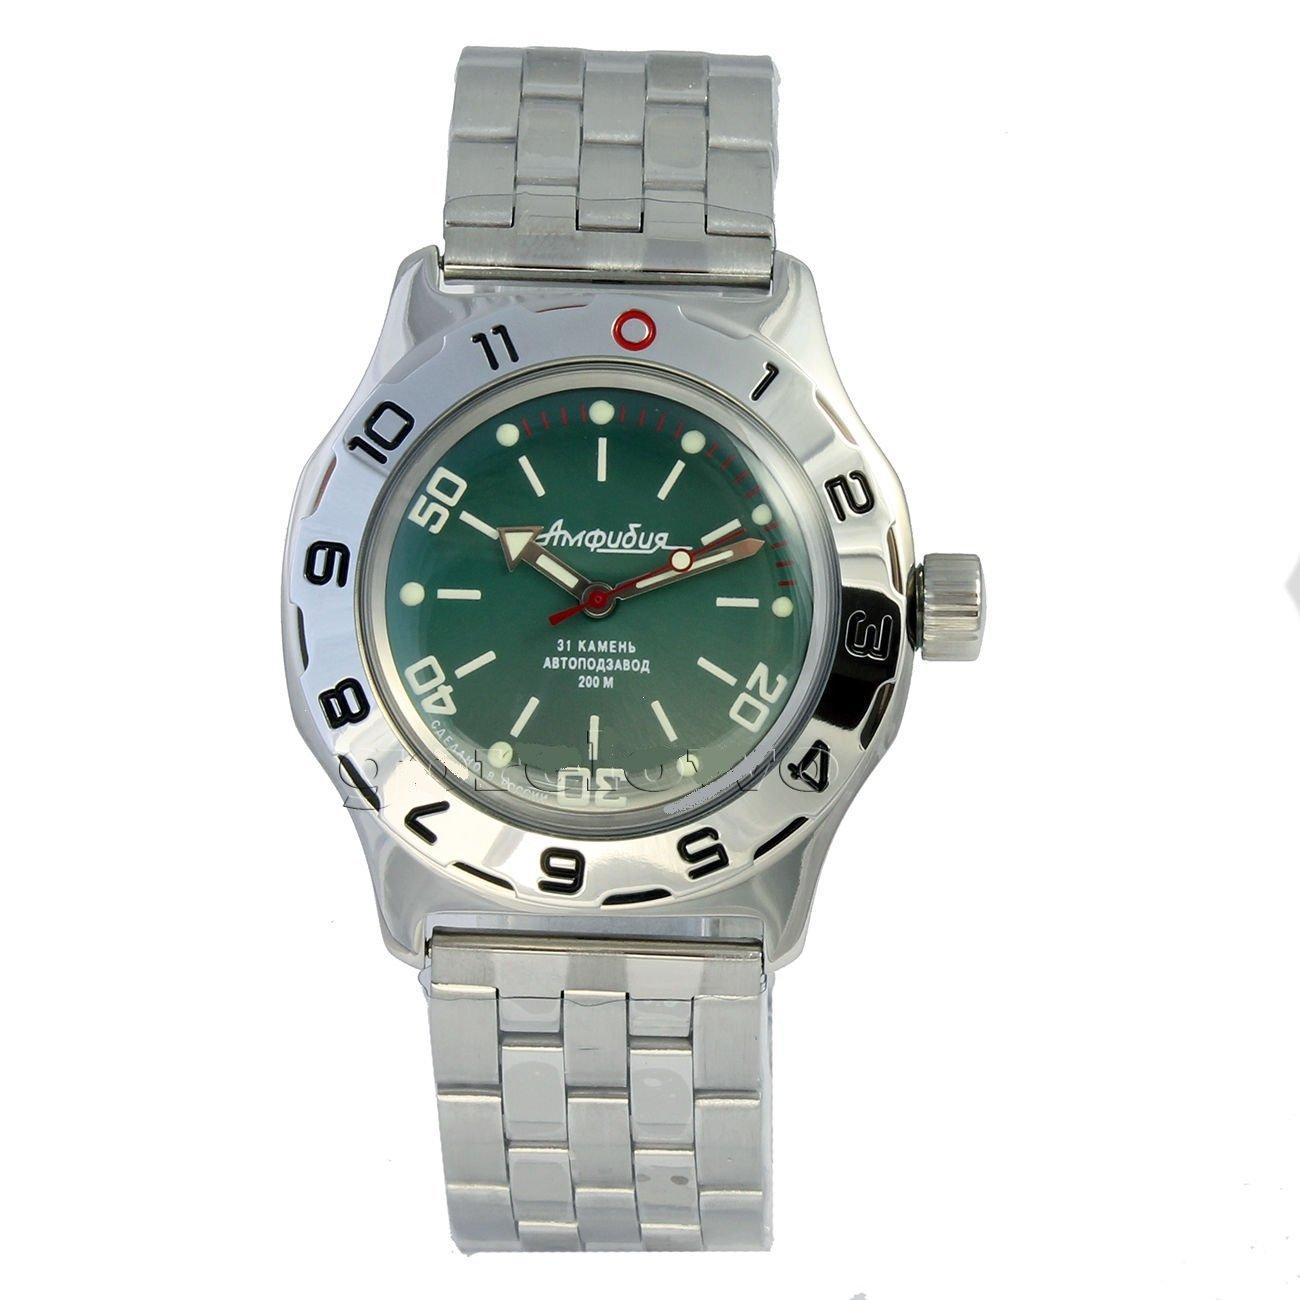 Vostok New Amphibian 100821 Russian Automatic Divers Wrist Watch 200m Auto Green